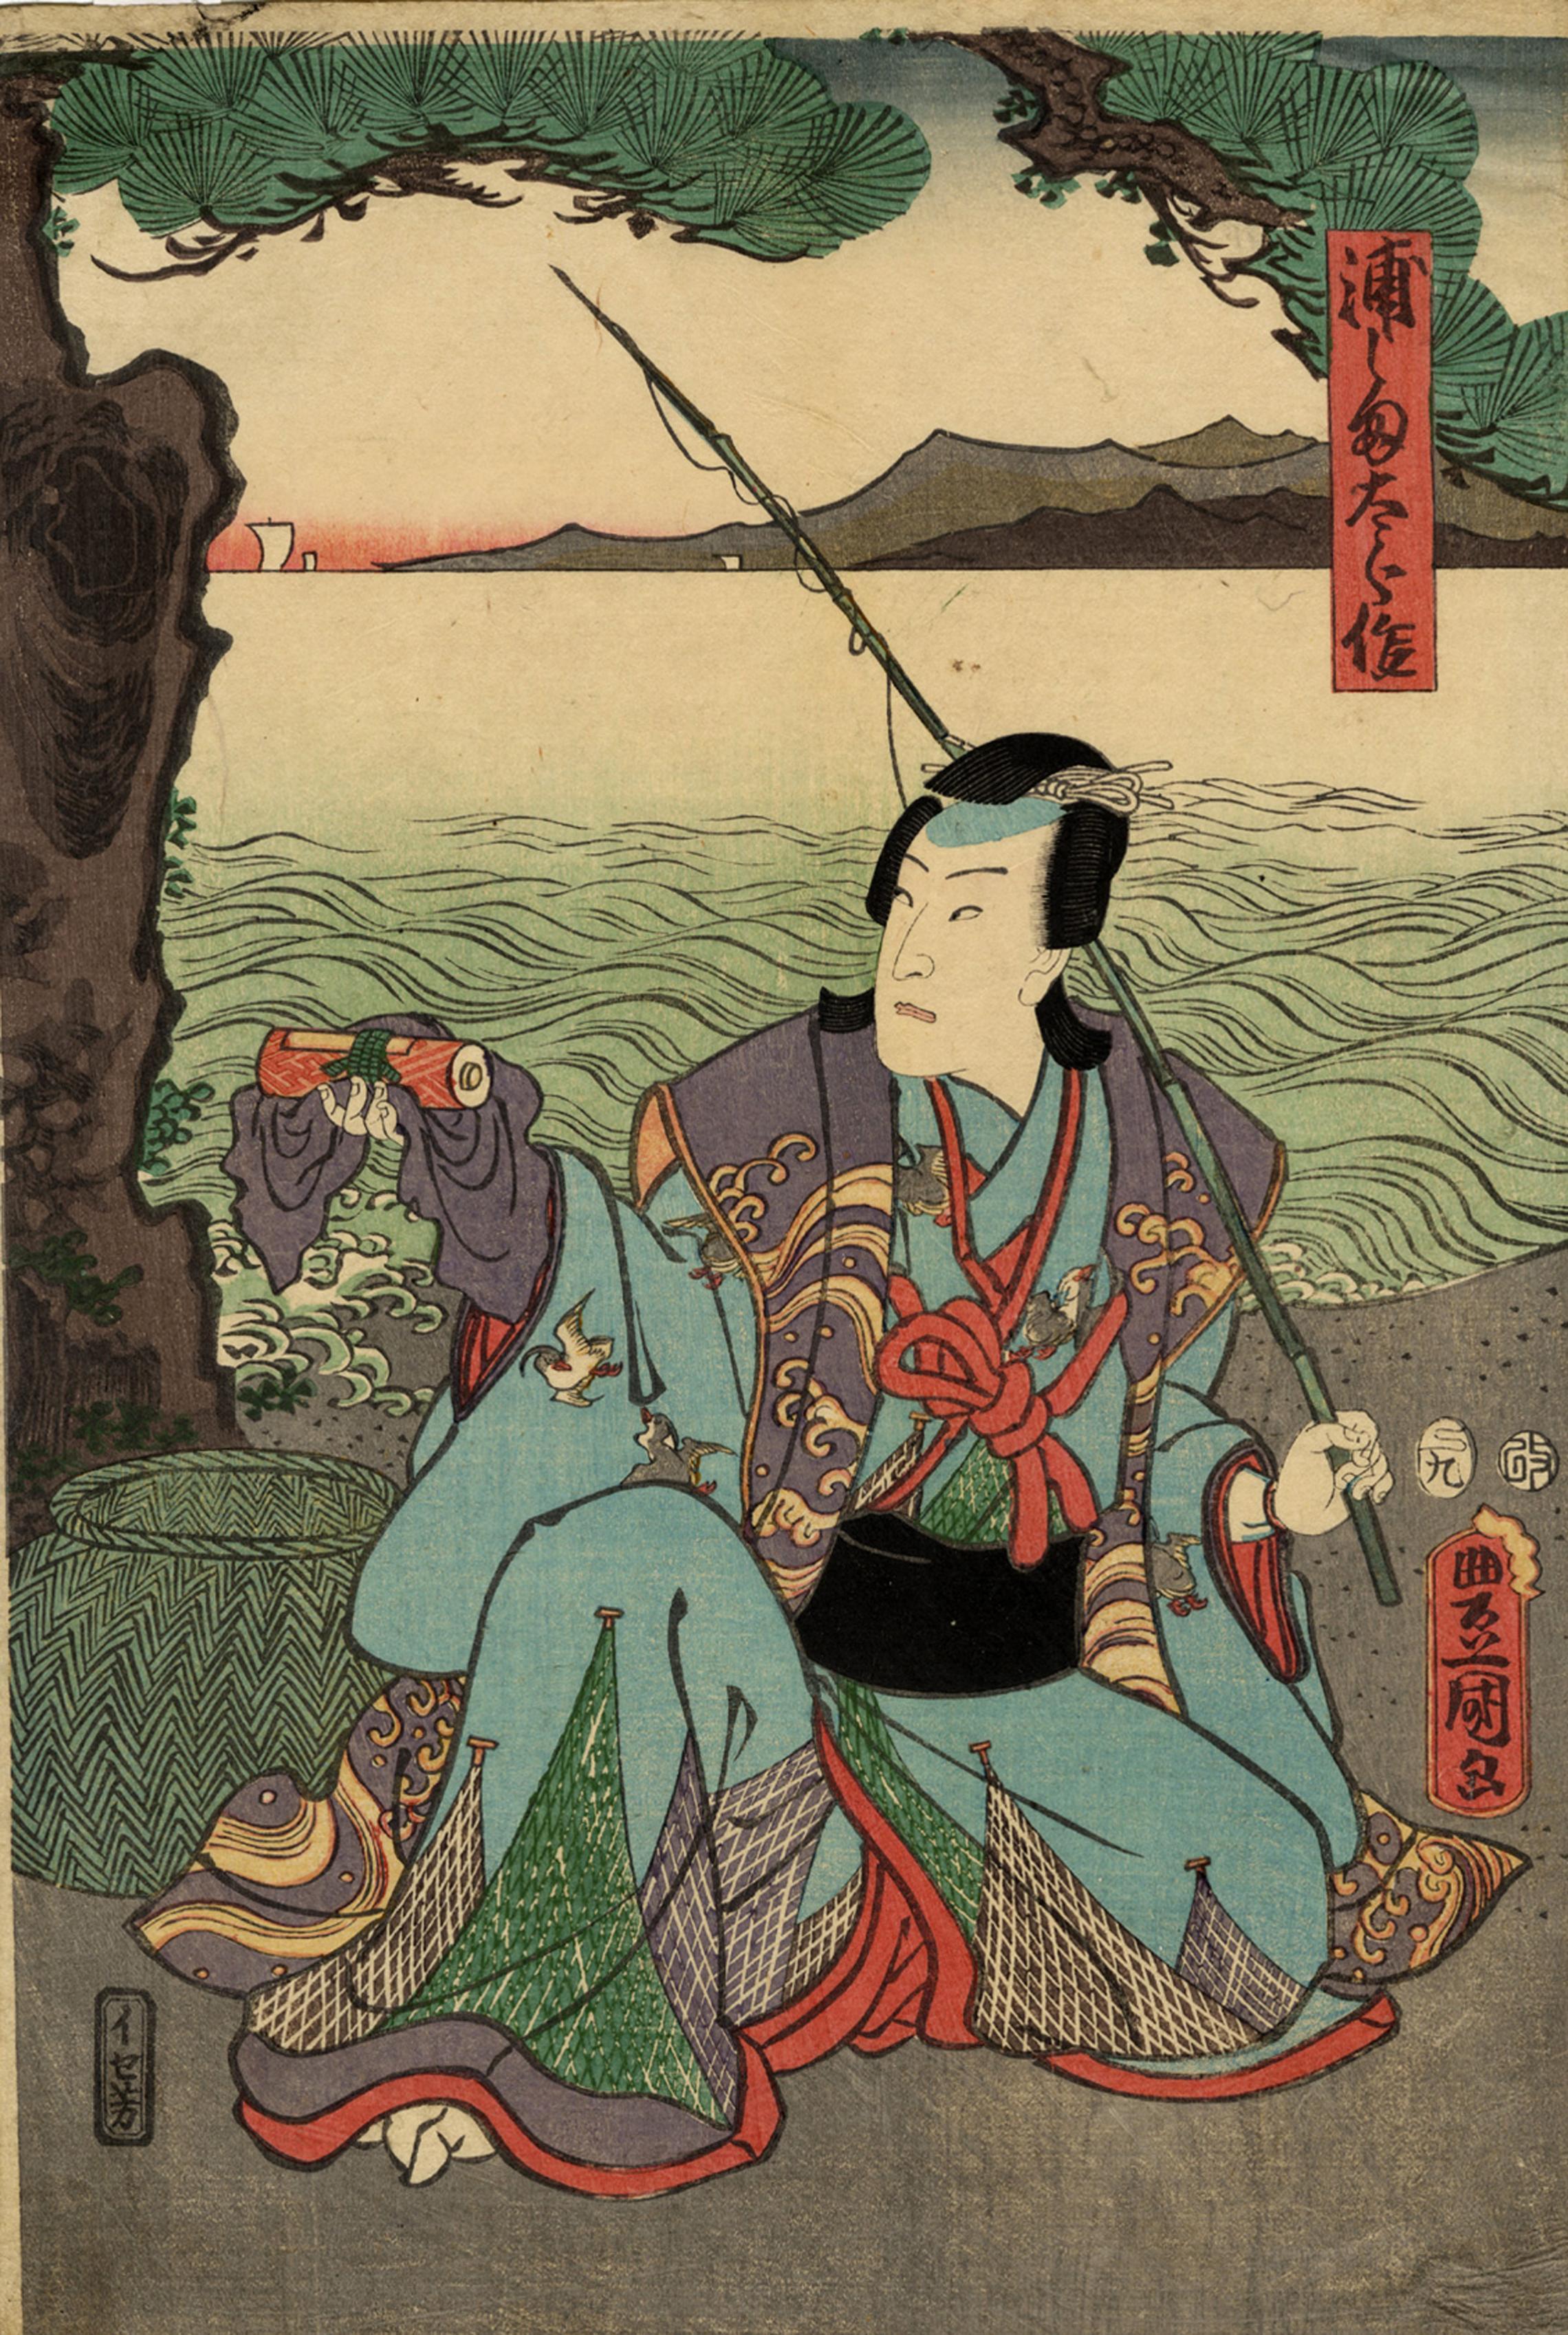 Utagawa Kunisada Japanese 1786 1864 Urashima Taro 1857 Color Woodblock Print Oban Format 14 1 8 X 9 3 4 In 3588 2477 Cm Museum Collection